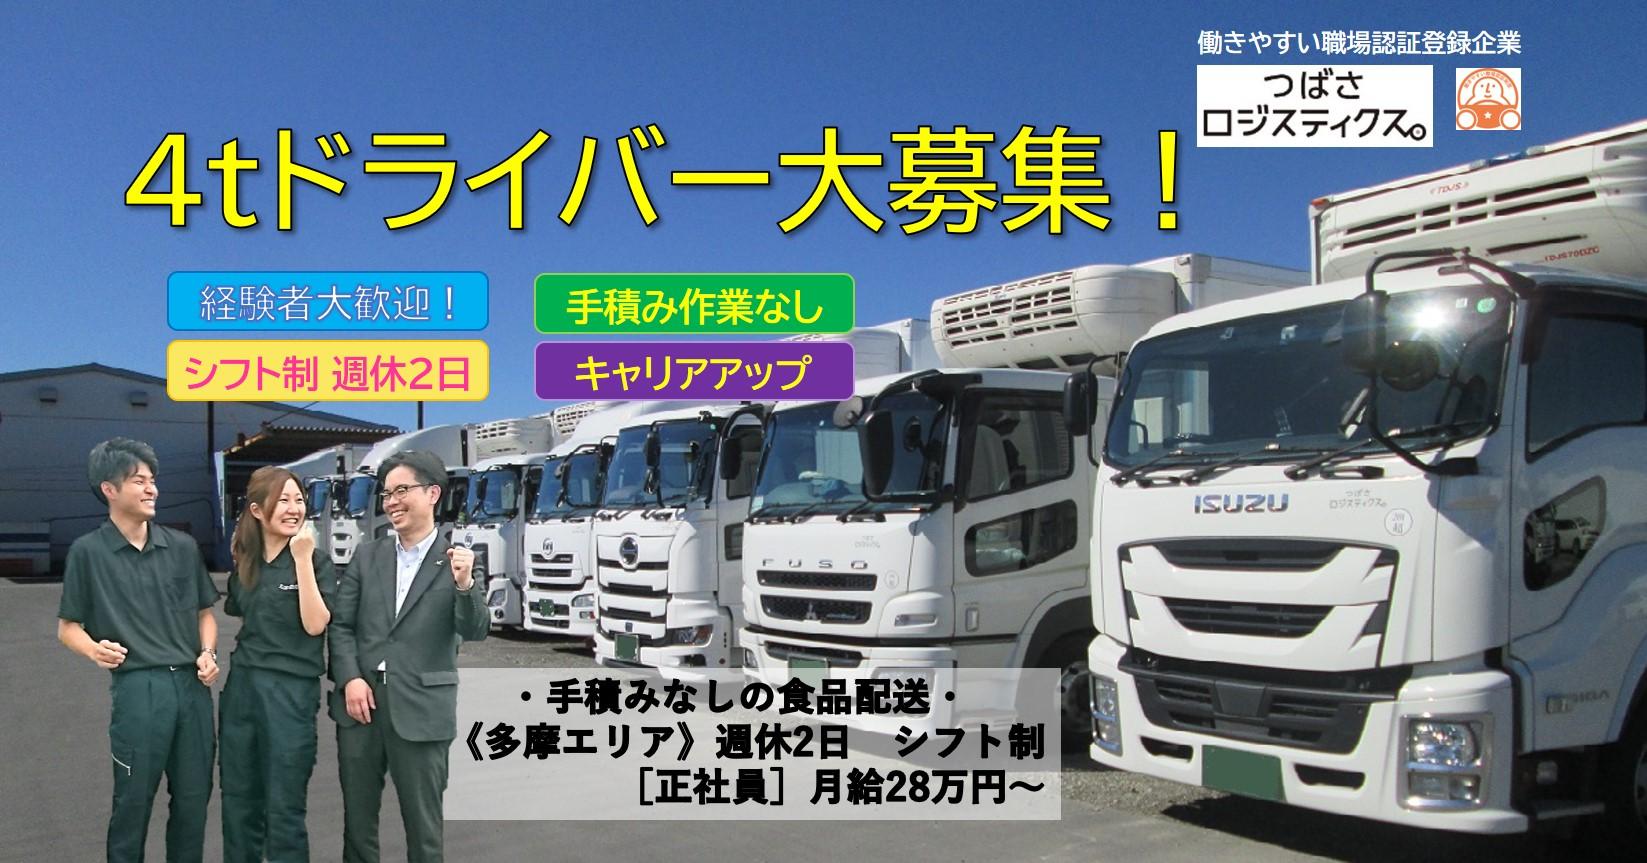 4tドライバー_Komagata Base_つばさロジスティクス